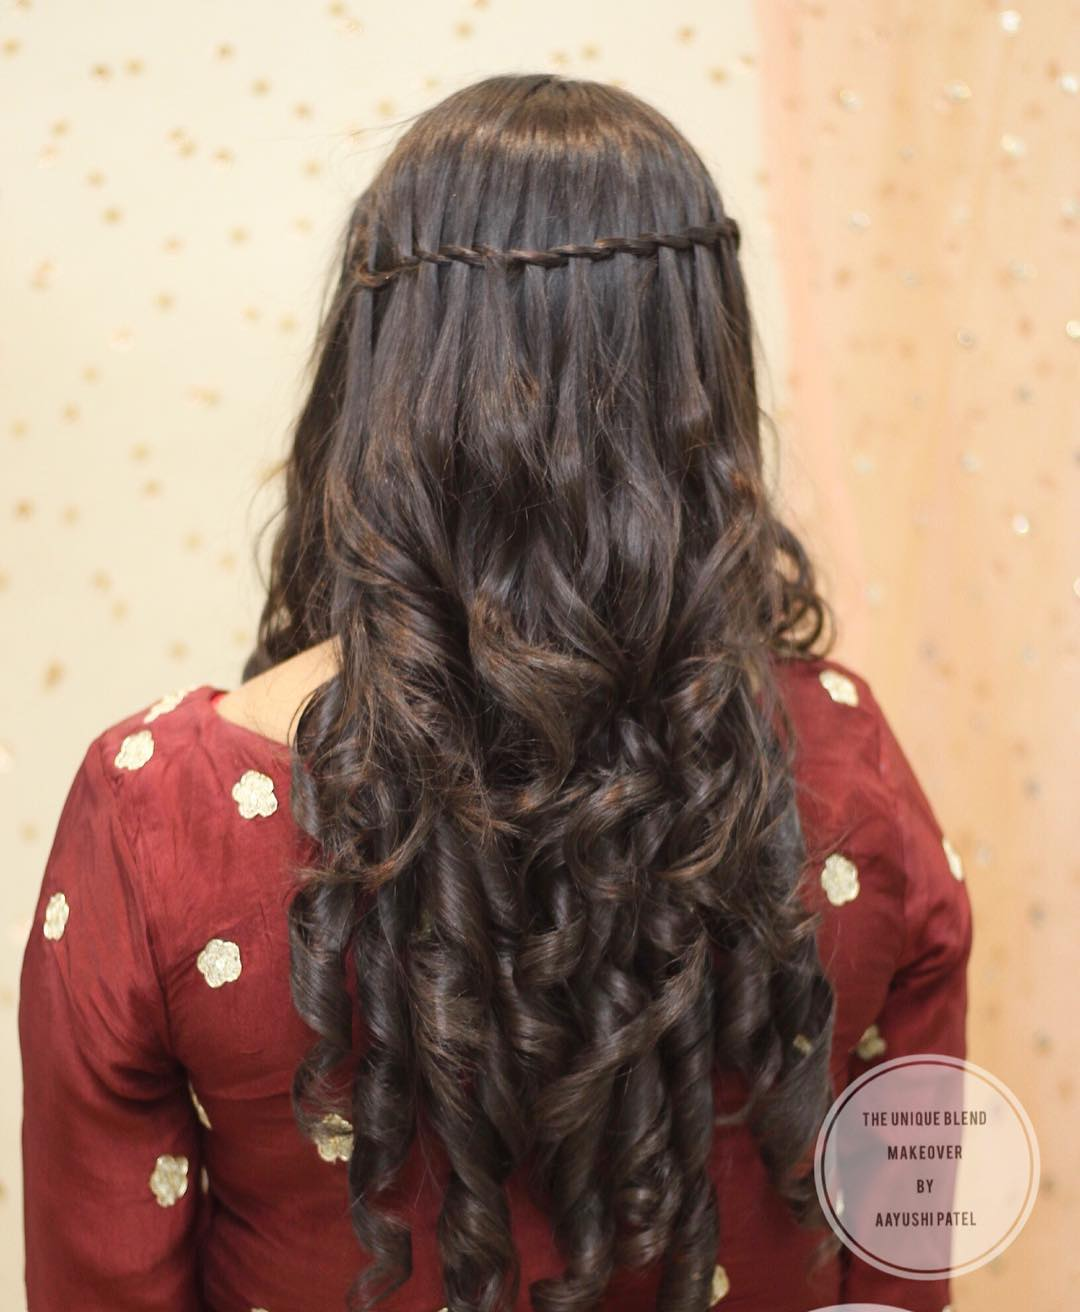 Waterfall braid: Floral hairstyles for Haldi and Mehendi Ceremonies!a